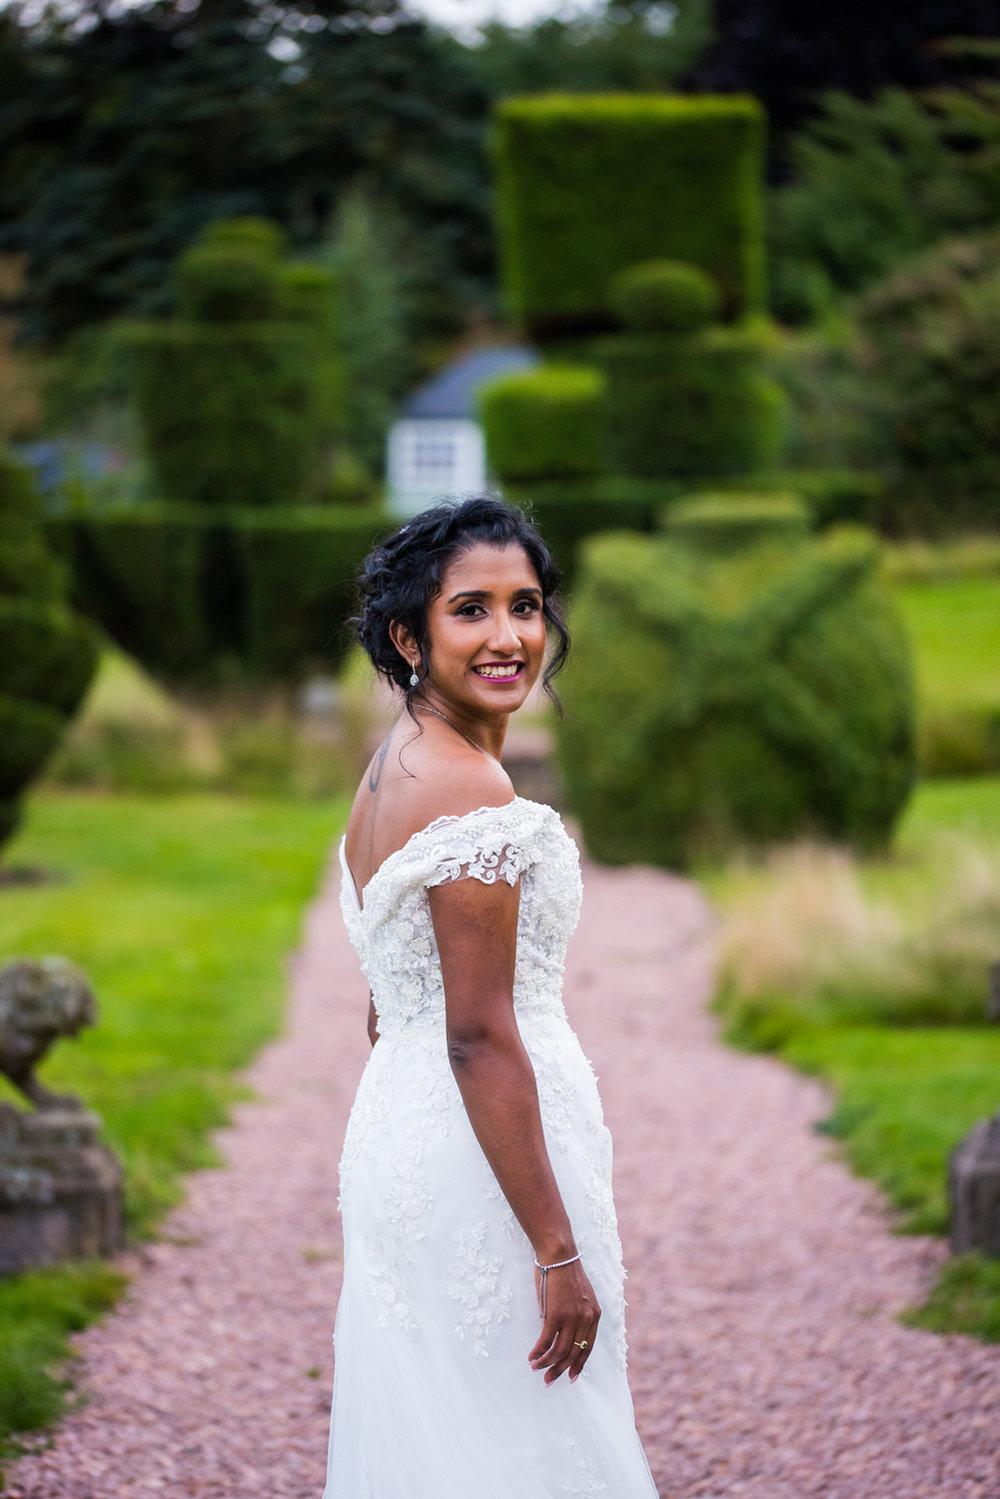 Kev and Shrabani wedding photos (281 of 350).jpg